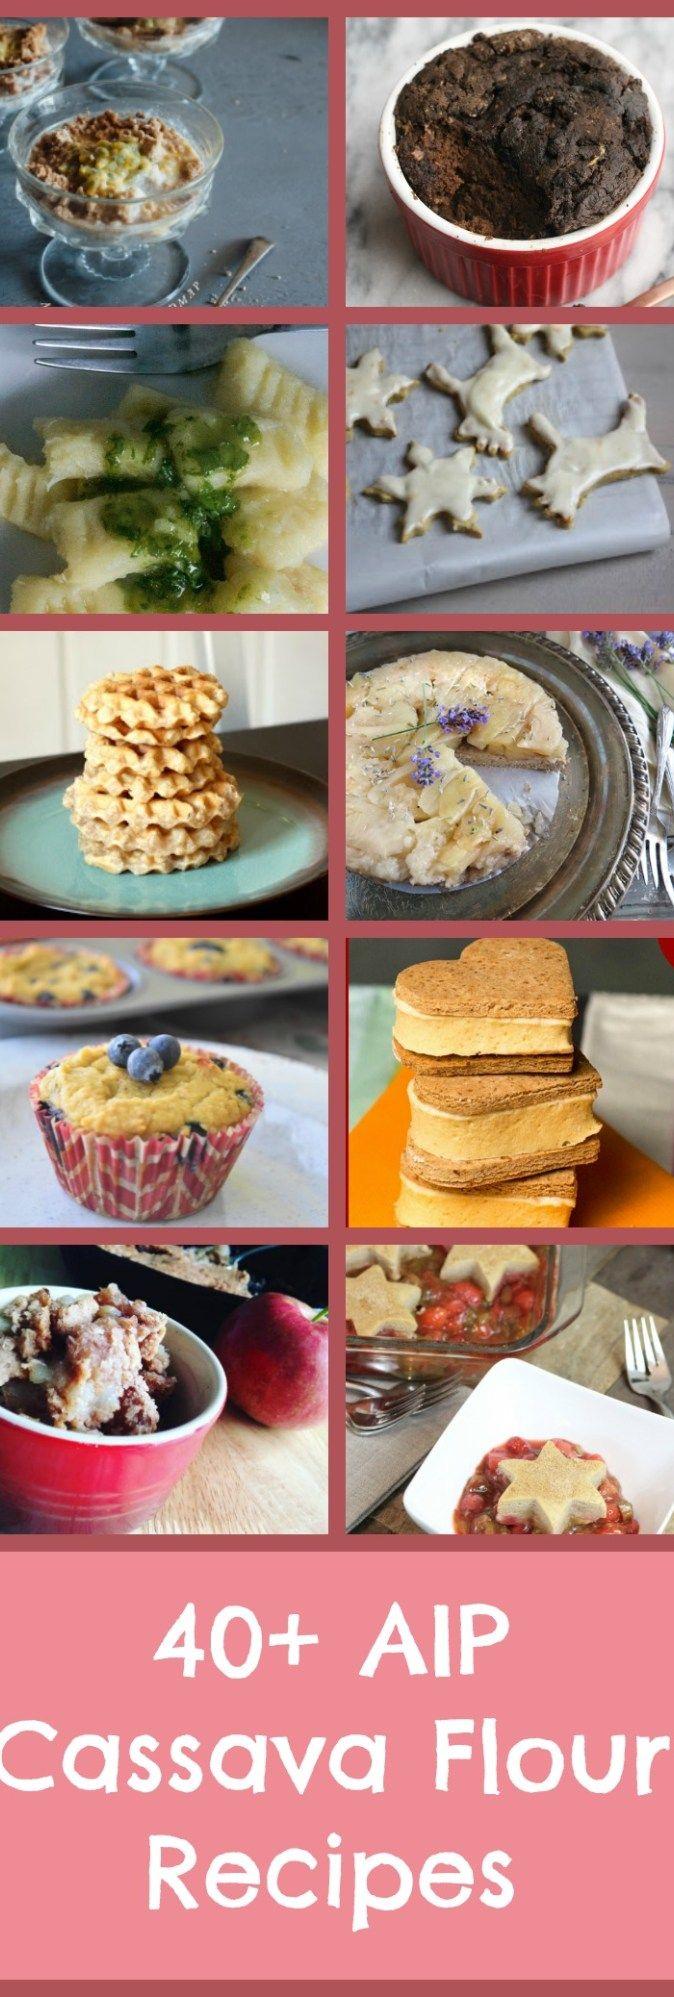 Cassava Flour: 40+ Favorite AIP Recipes - Gutsy By Nature